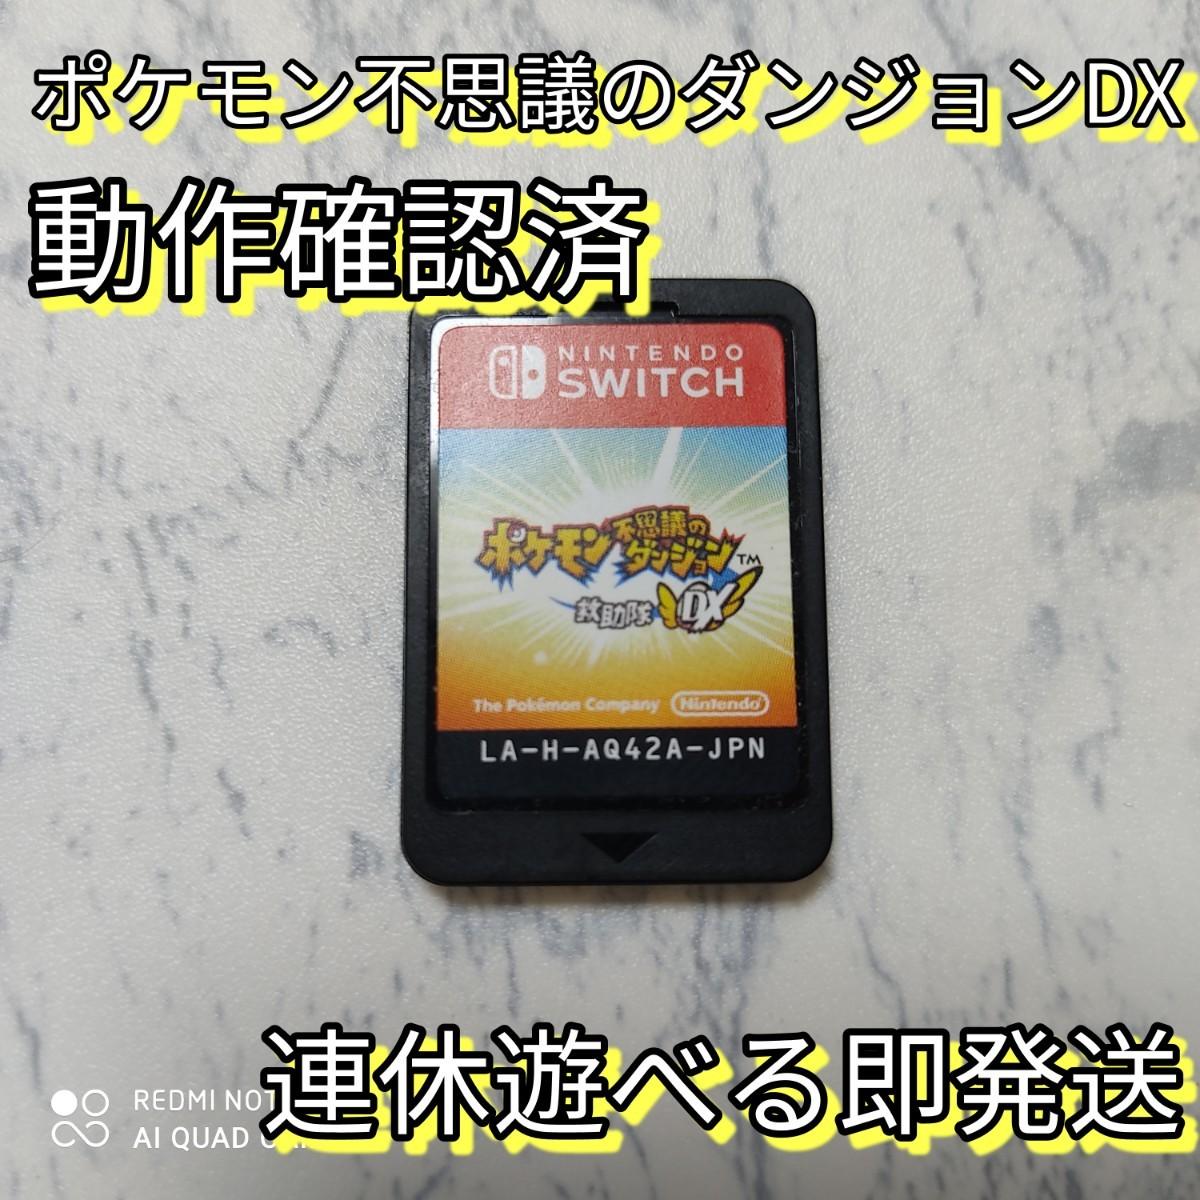 Switchソフト ポケモン不思議のダンジョン 救助隊DX